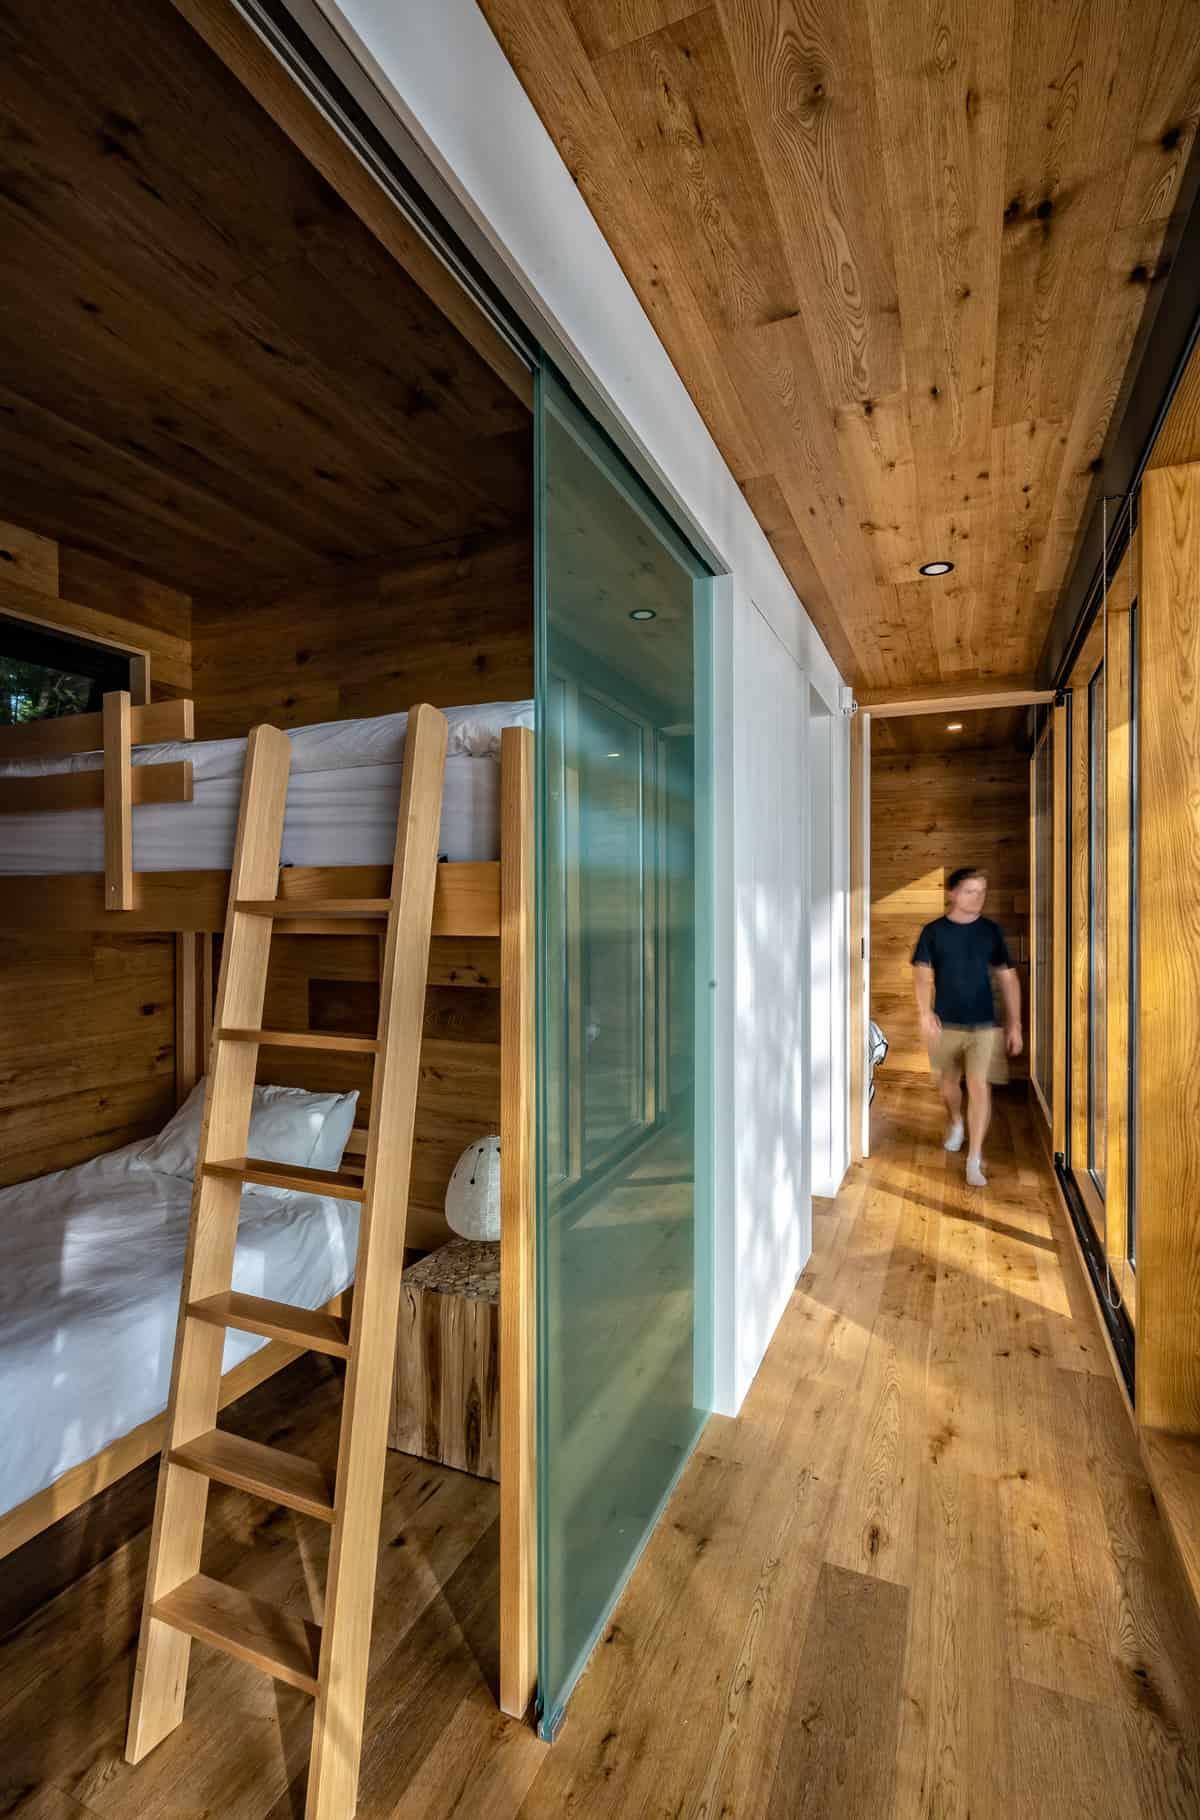 rustic-hallway-with-bunk-beds